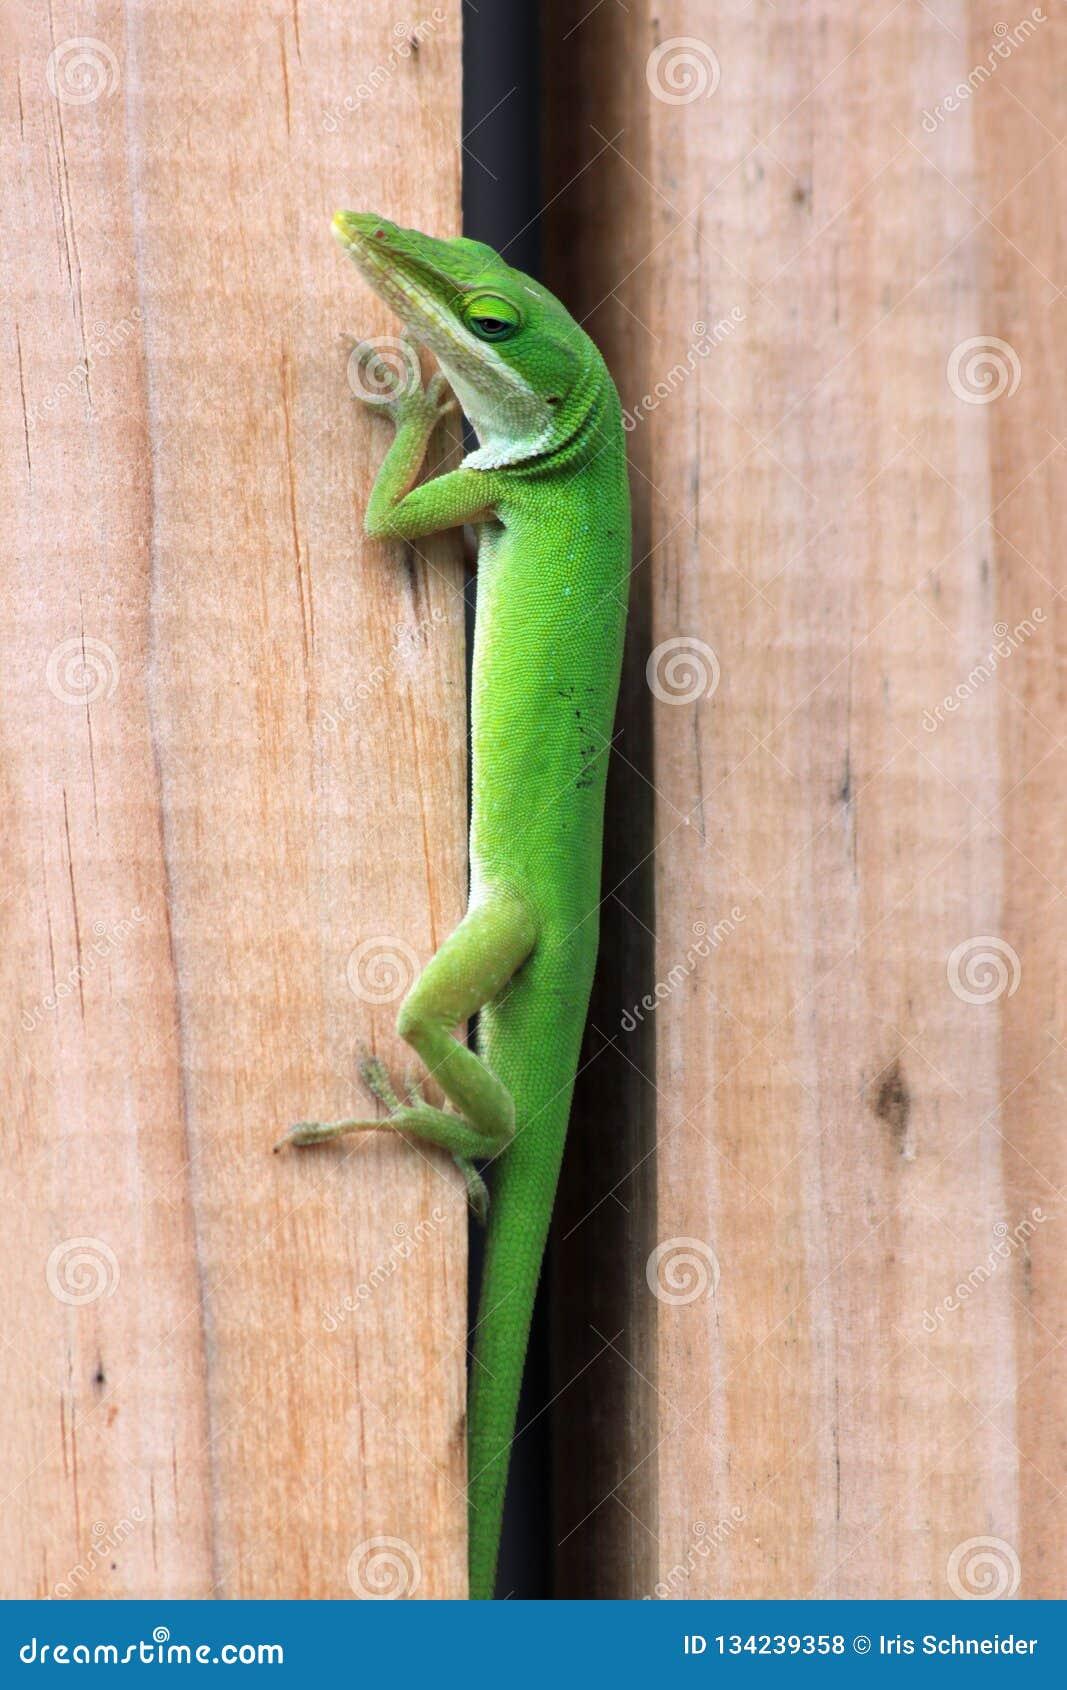 Anole verde que intenta ocultar entre una cerca de madera